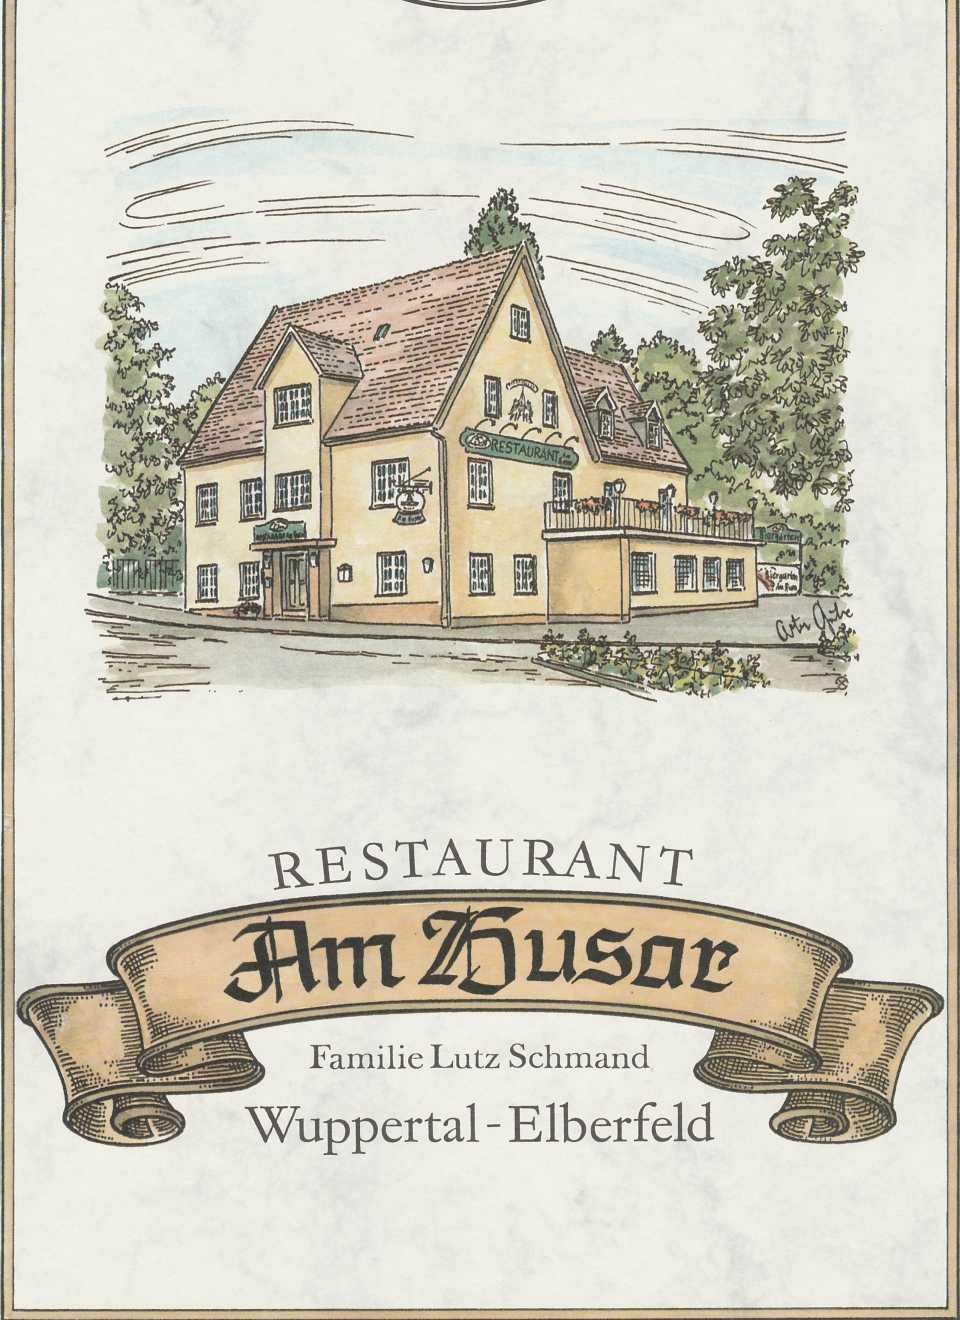 Küchenhilfe m/w/d in Wuppertal, ab sofort, Aushilfe/Minijob ...